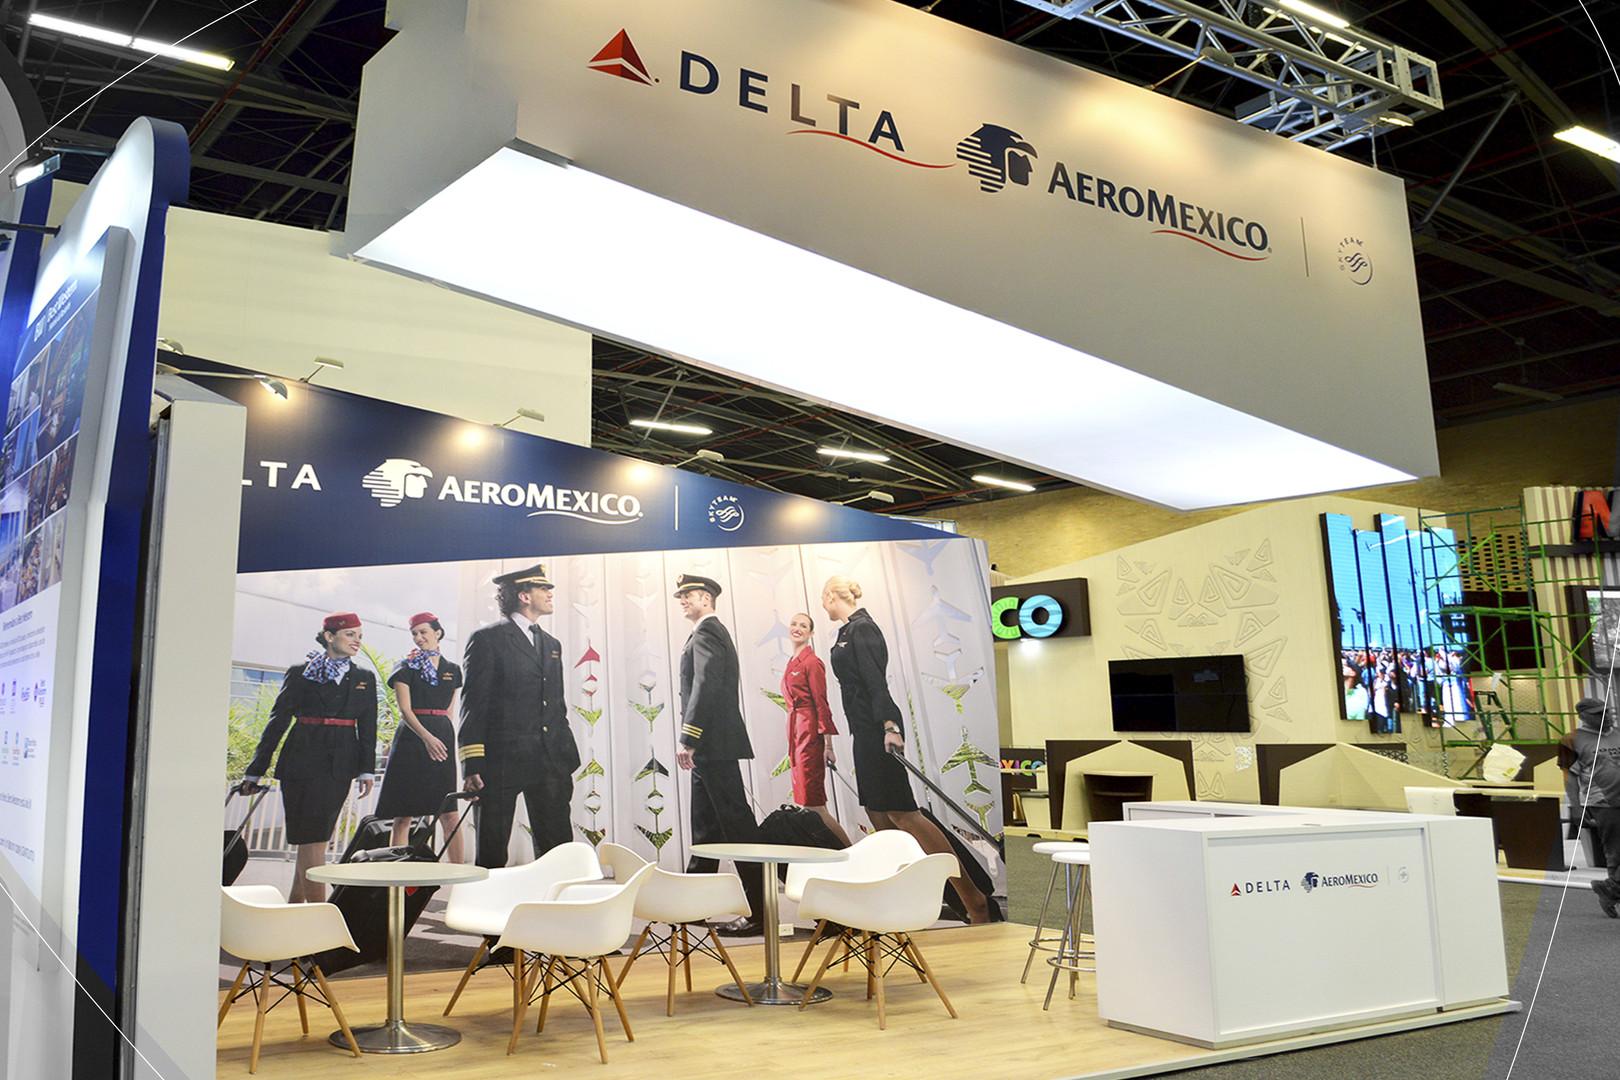 Delta_Panorama_sin_título5.jpg